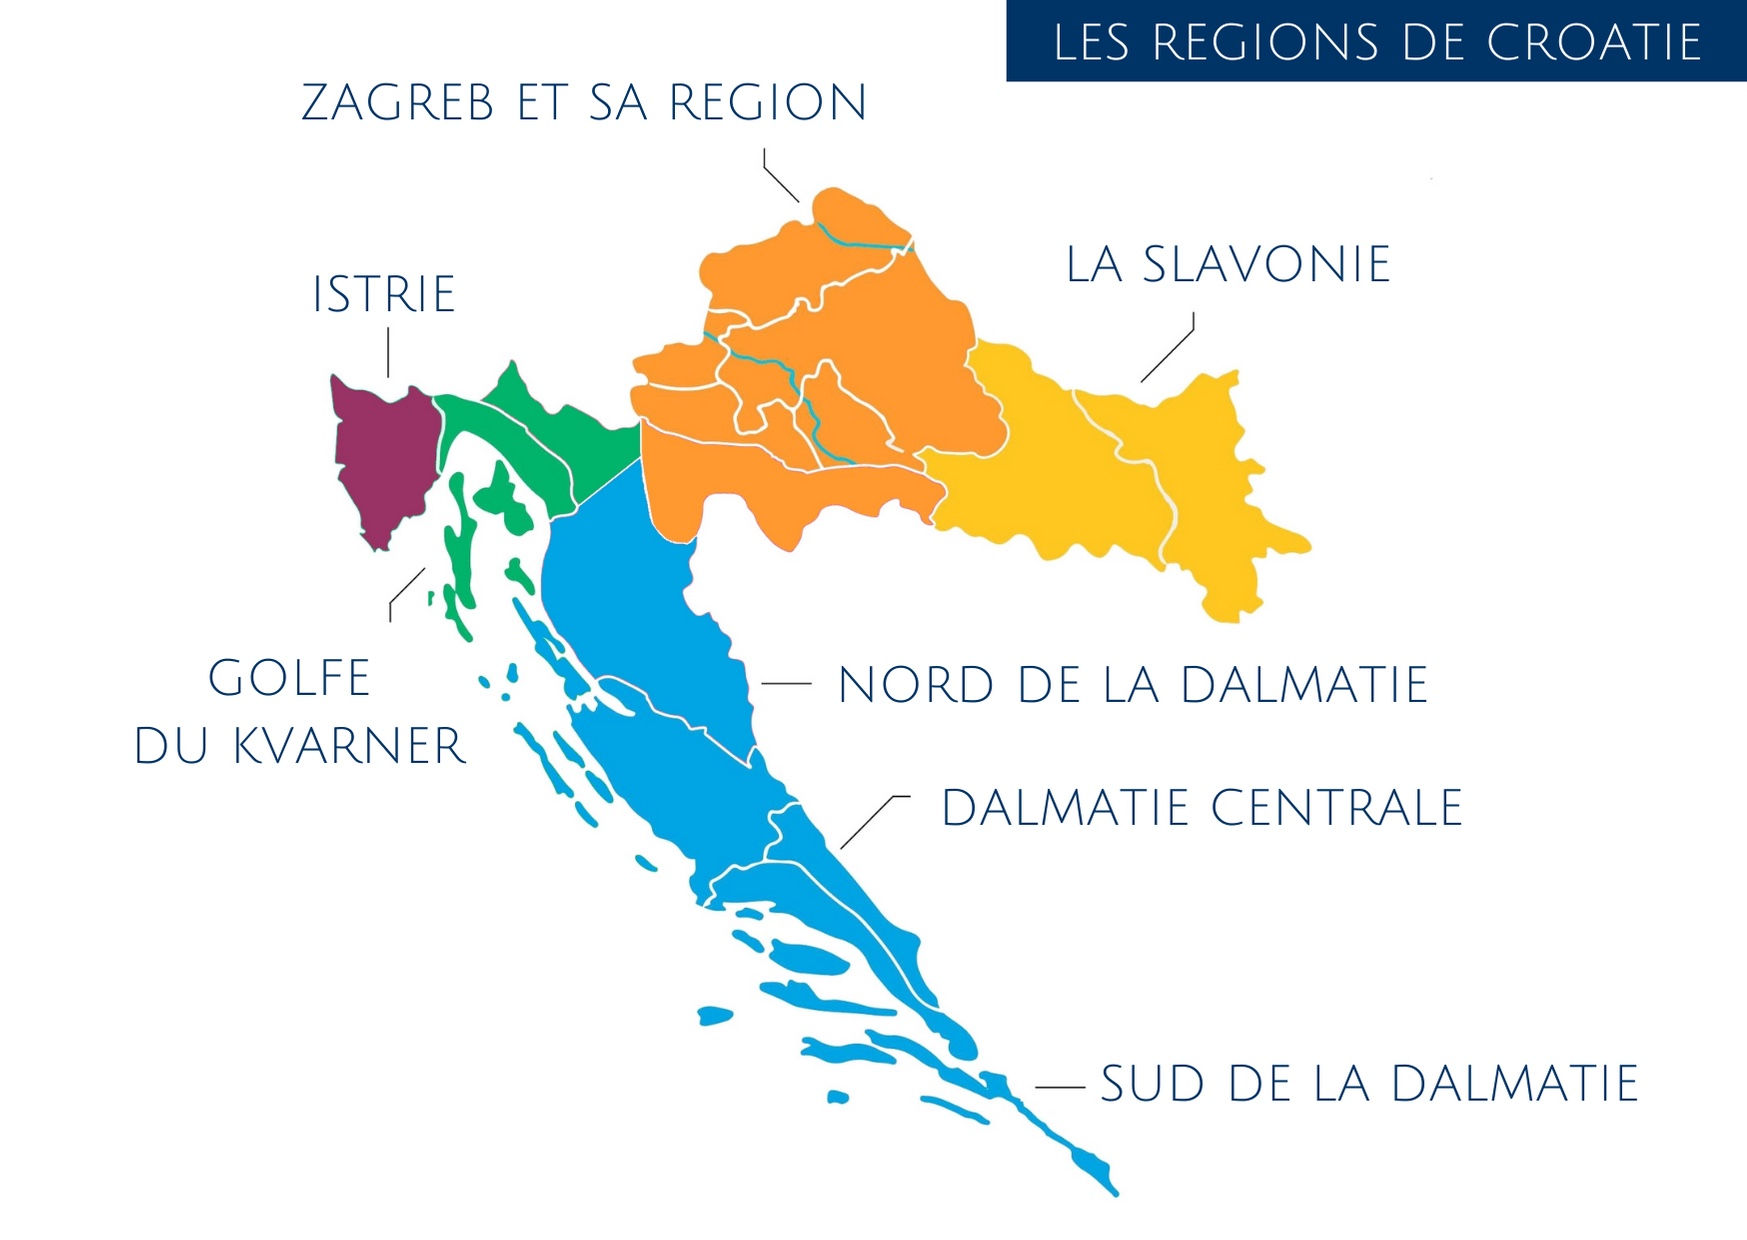 les regions en croatie